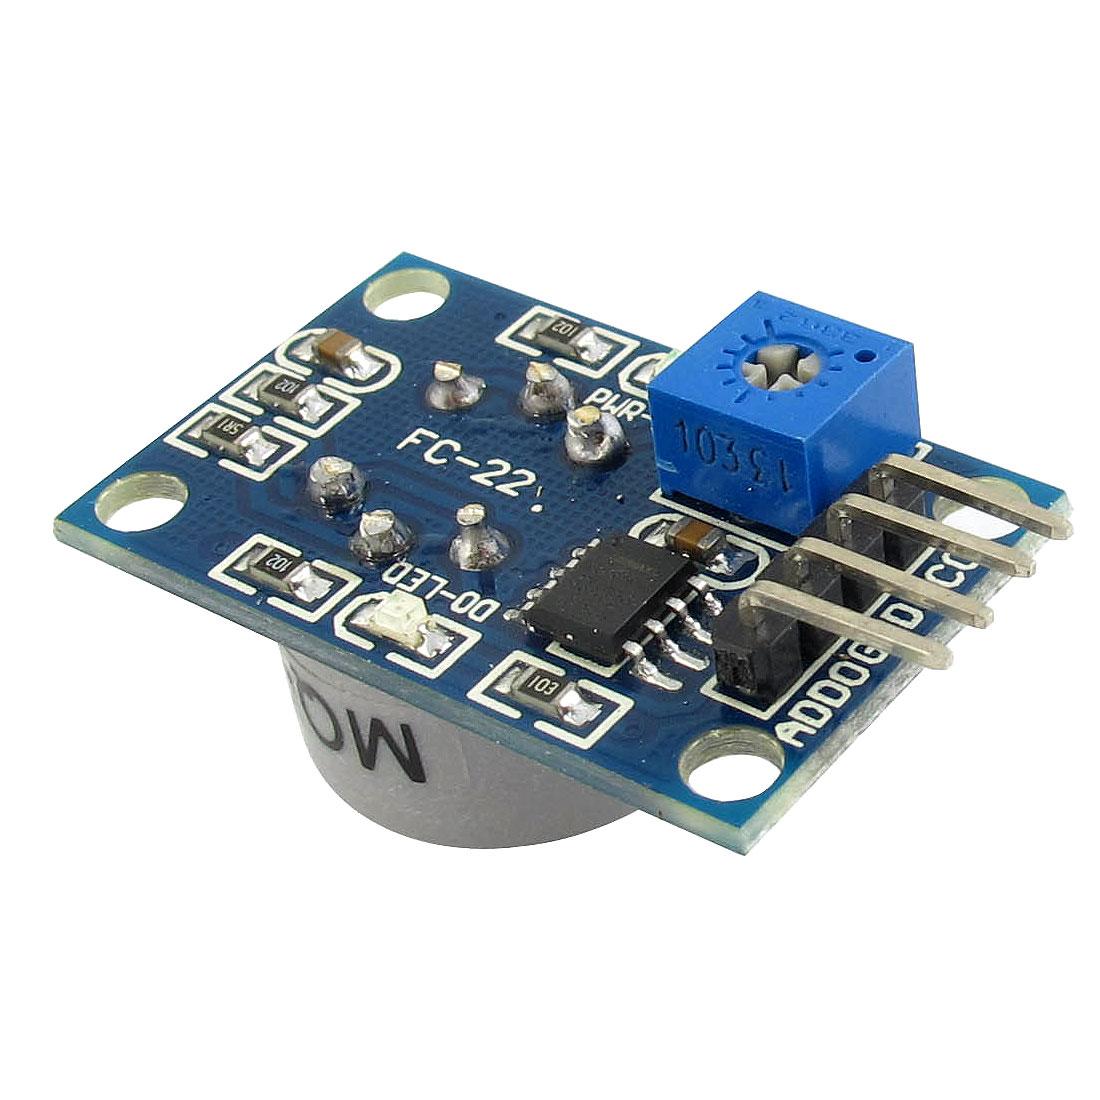 MQ-7 Flammable Gas Sensitive Tester Checker Detection Carbon Monoxide CO Sensor PCB Module DC 5V 150mA